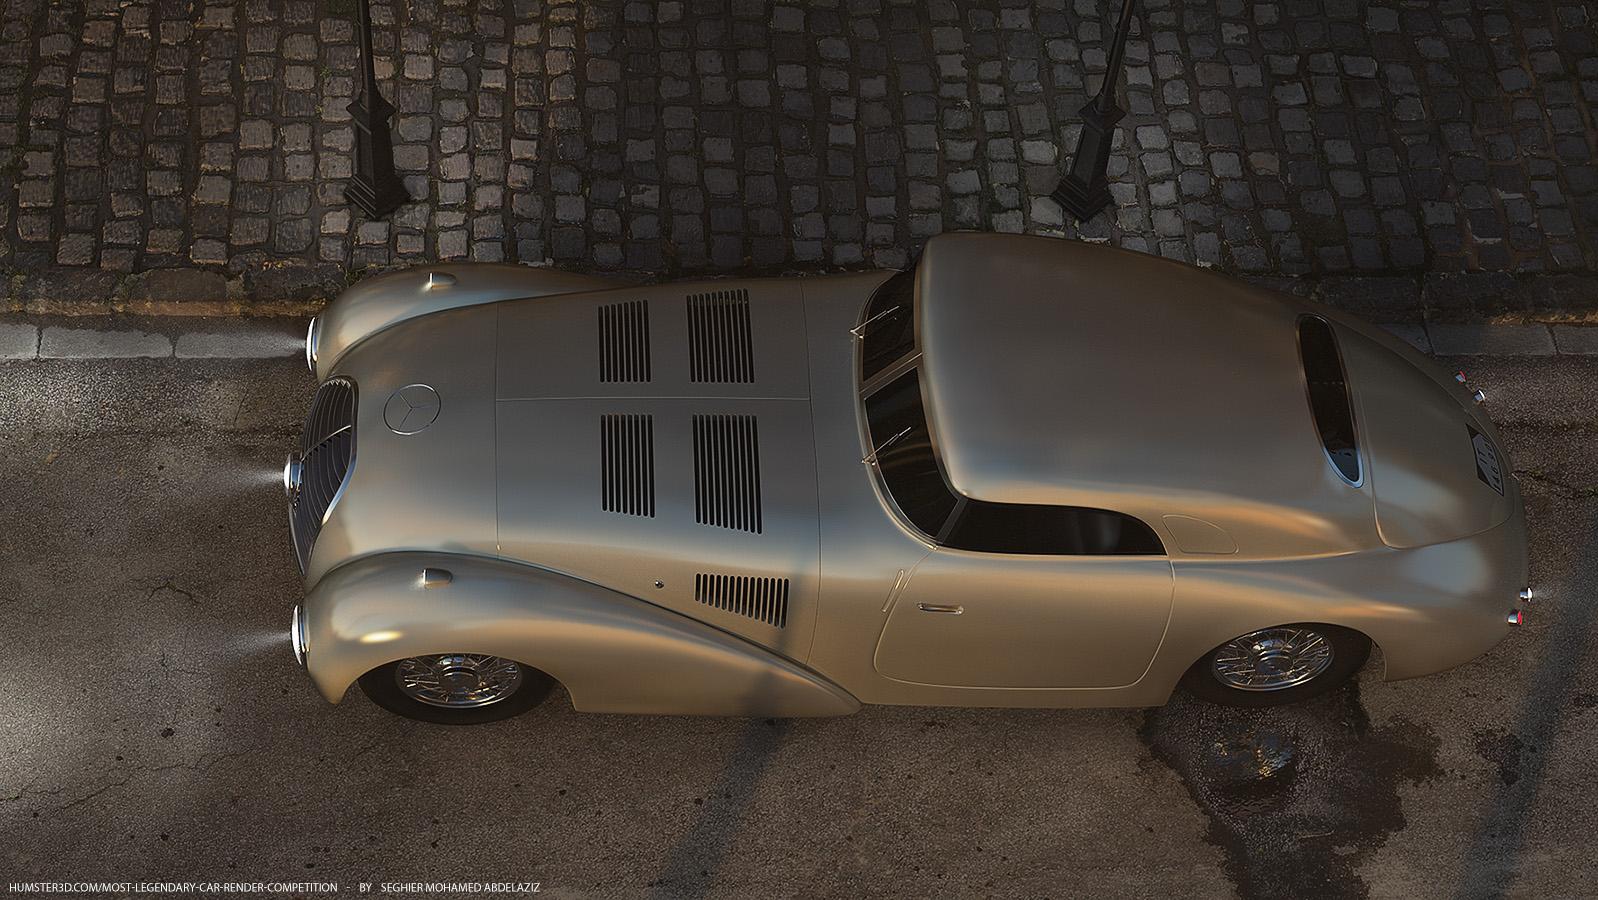 Piece of history: Mercedes-Benz 540k Streamliner 3d art